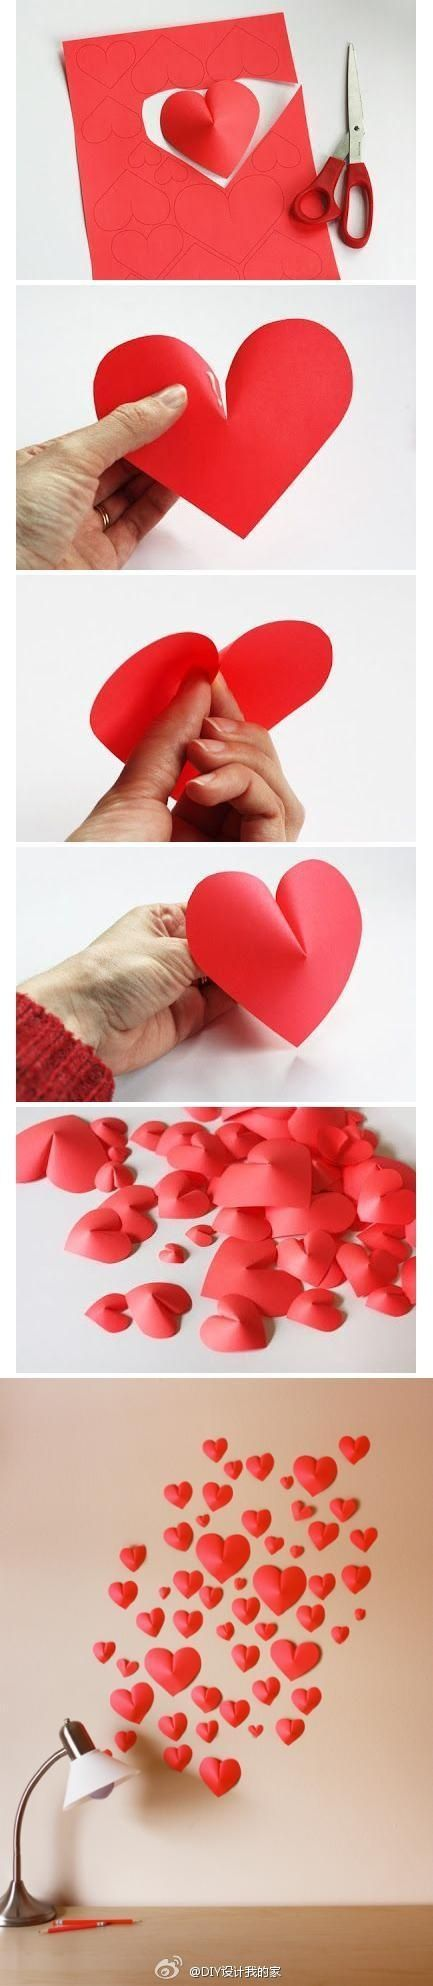 Make a 3D Paper Heart For Decoration - inspiring picture on Joyzz.com